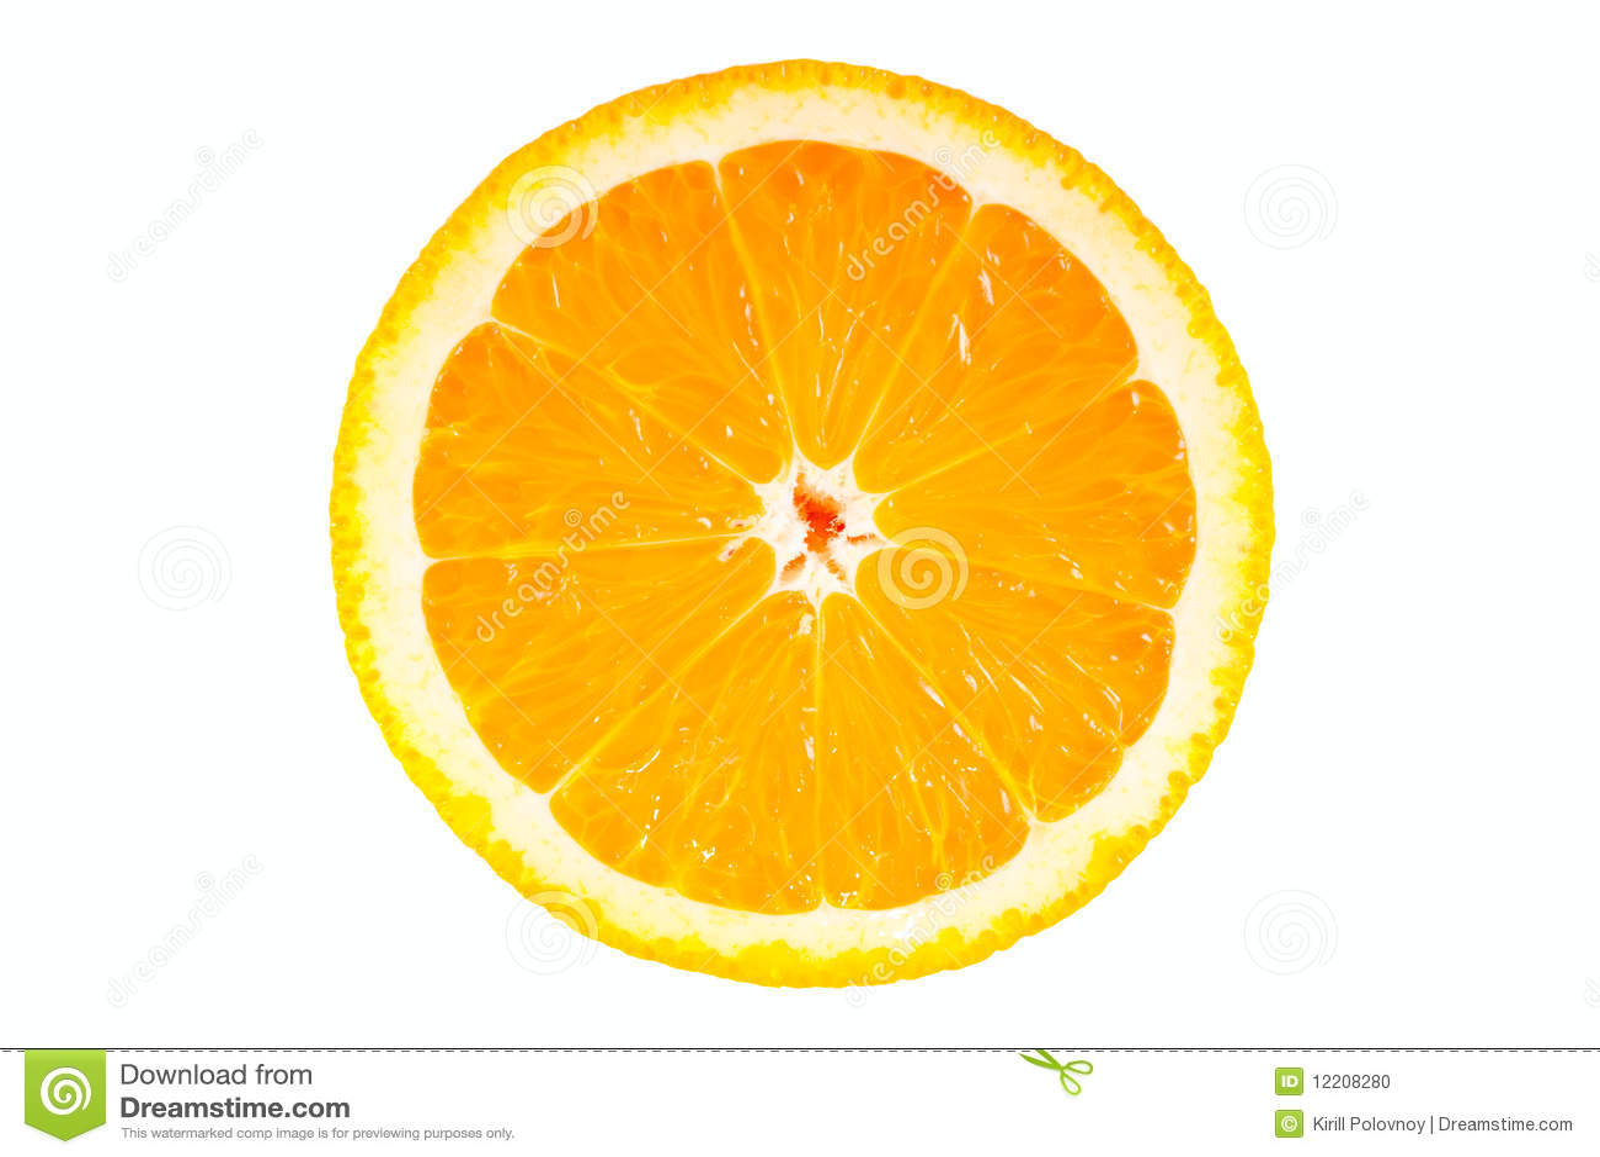 Orange half isolated